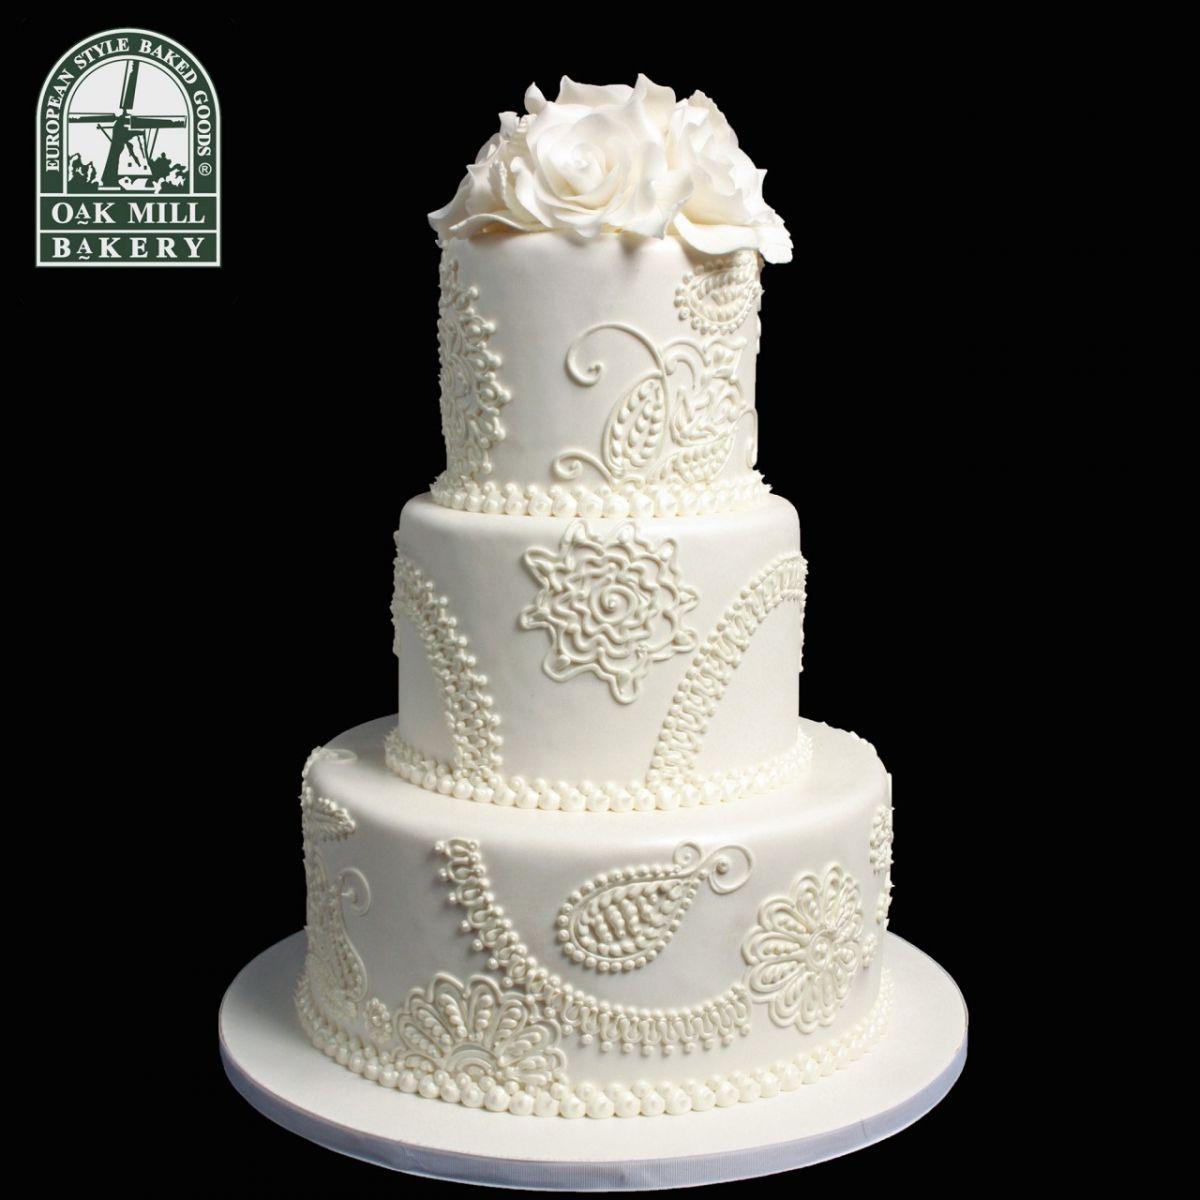 18 Wedding Cake Designs To Steal Allfreediyweddingscom